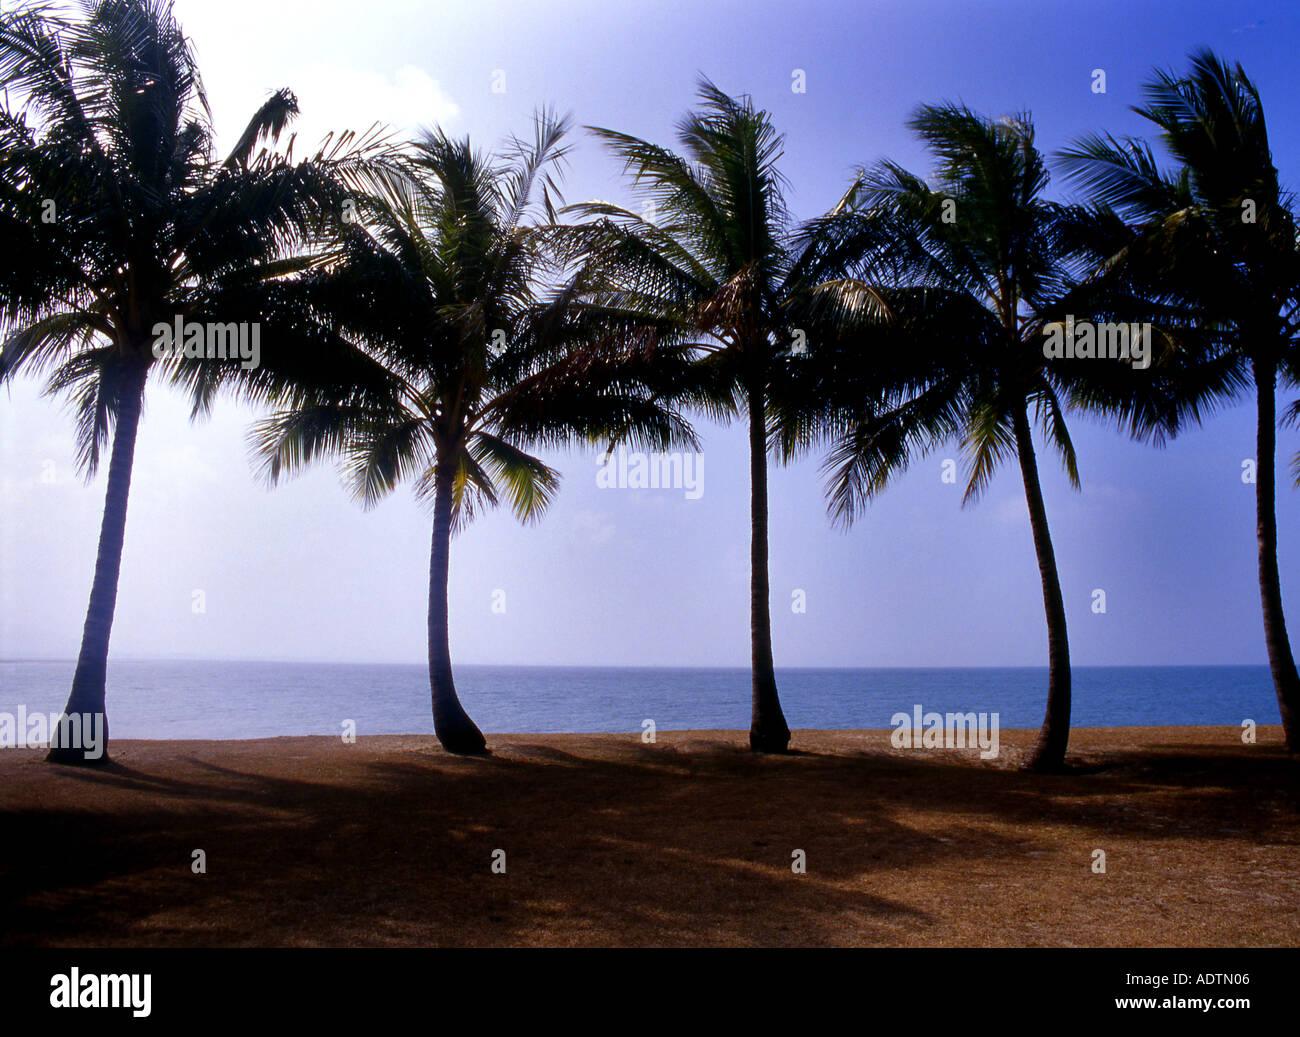 Palmtrees at Port Douglas Queensland - Stock Image